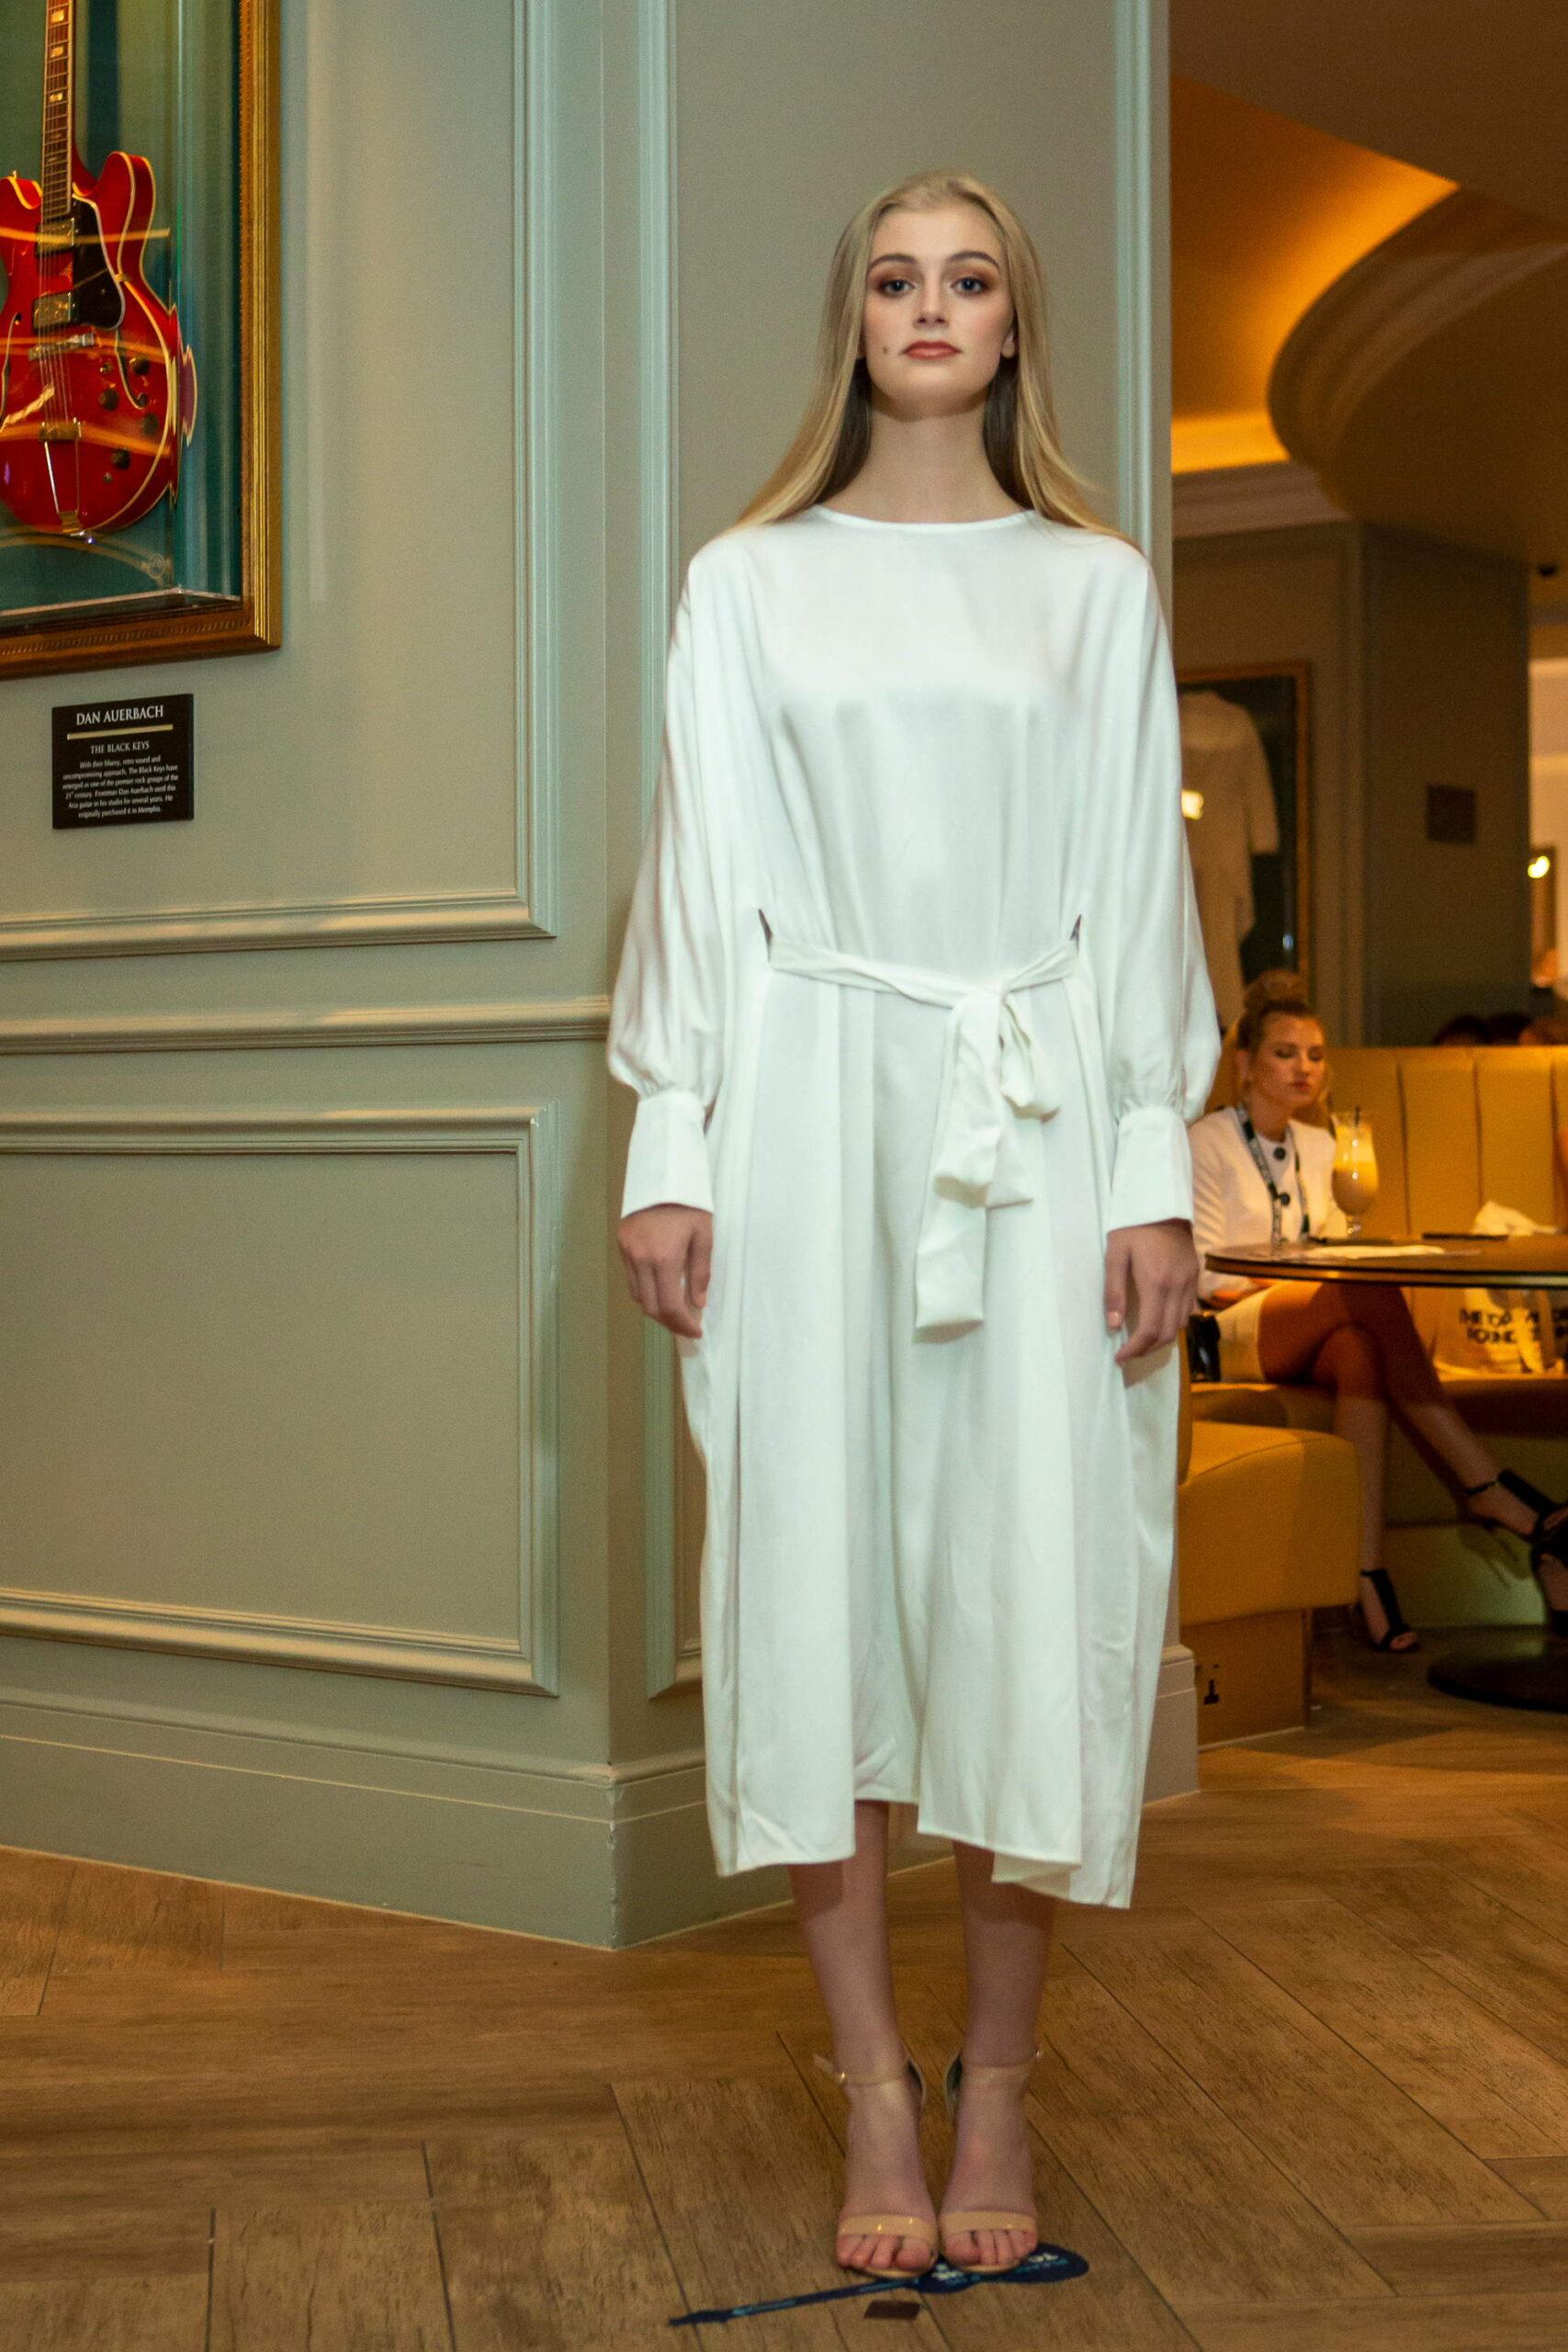 Designer: Omar Mansoor. Picture by Colin Chau/Fashion London